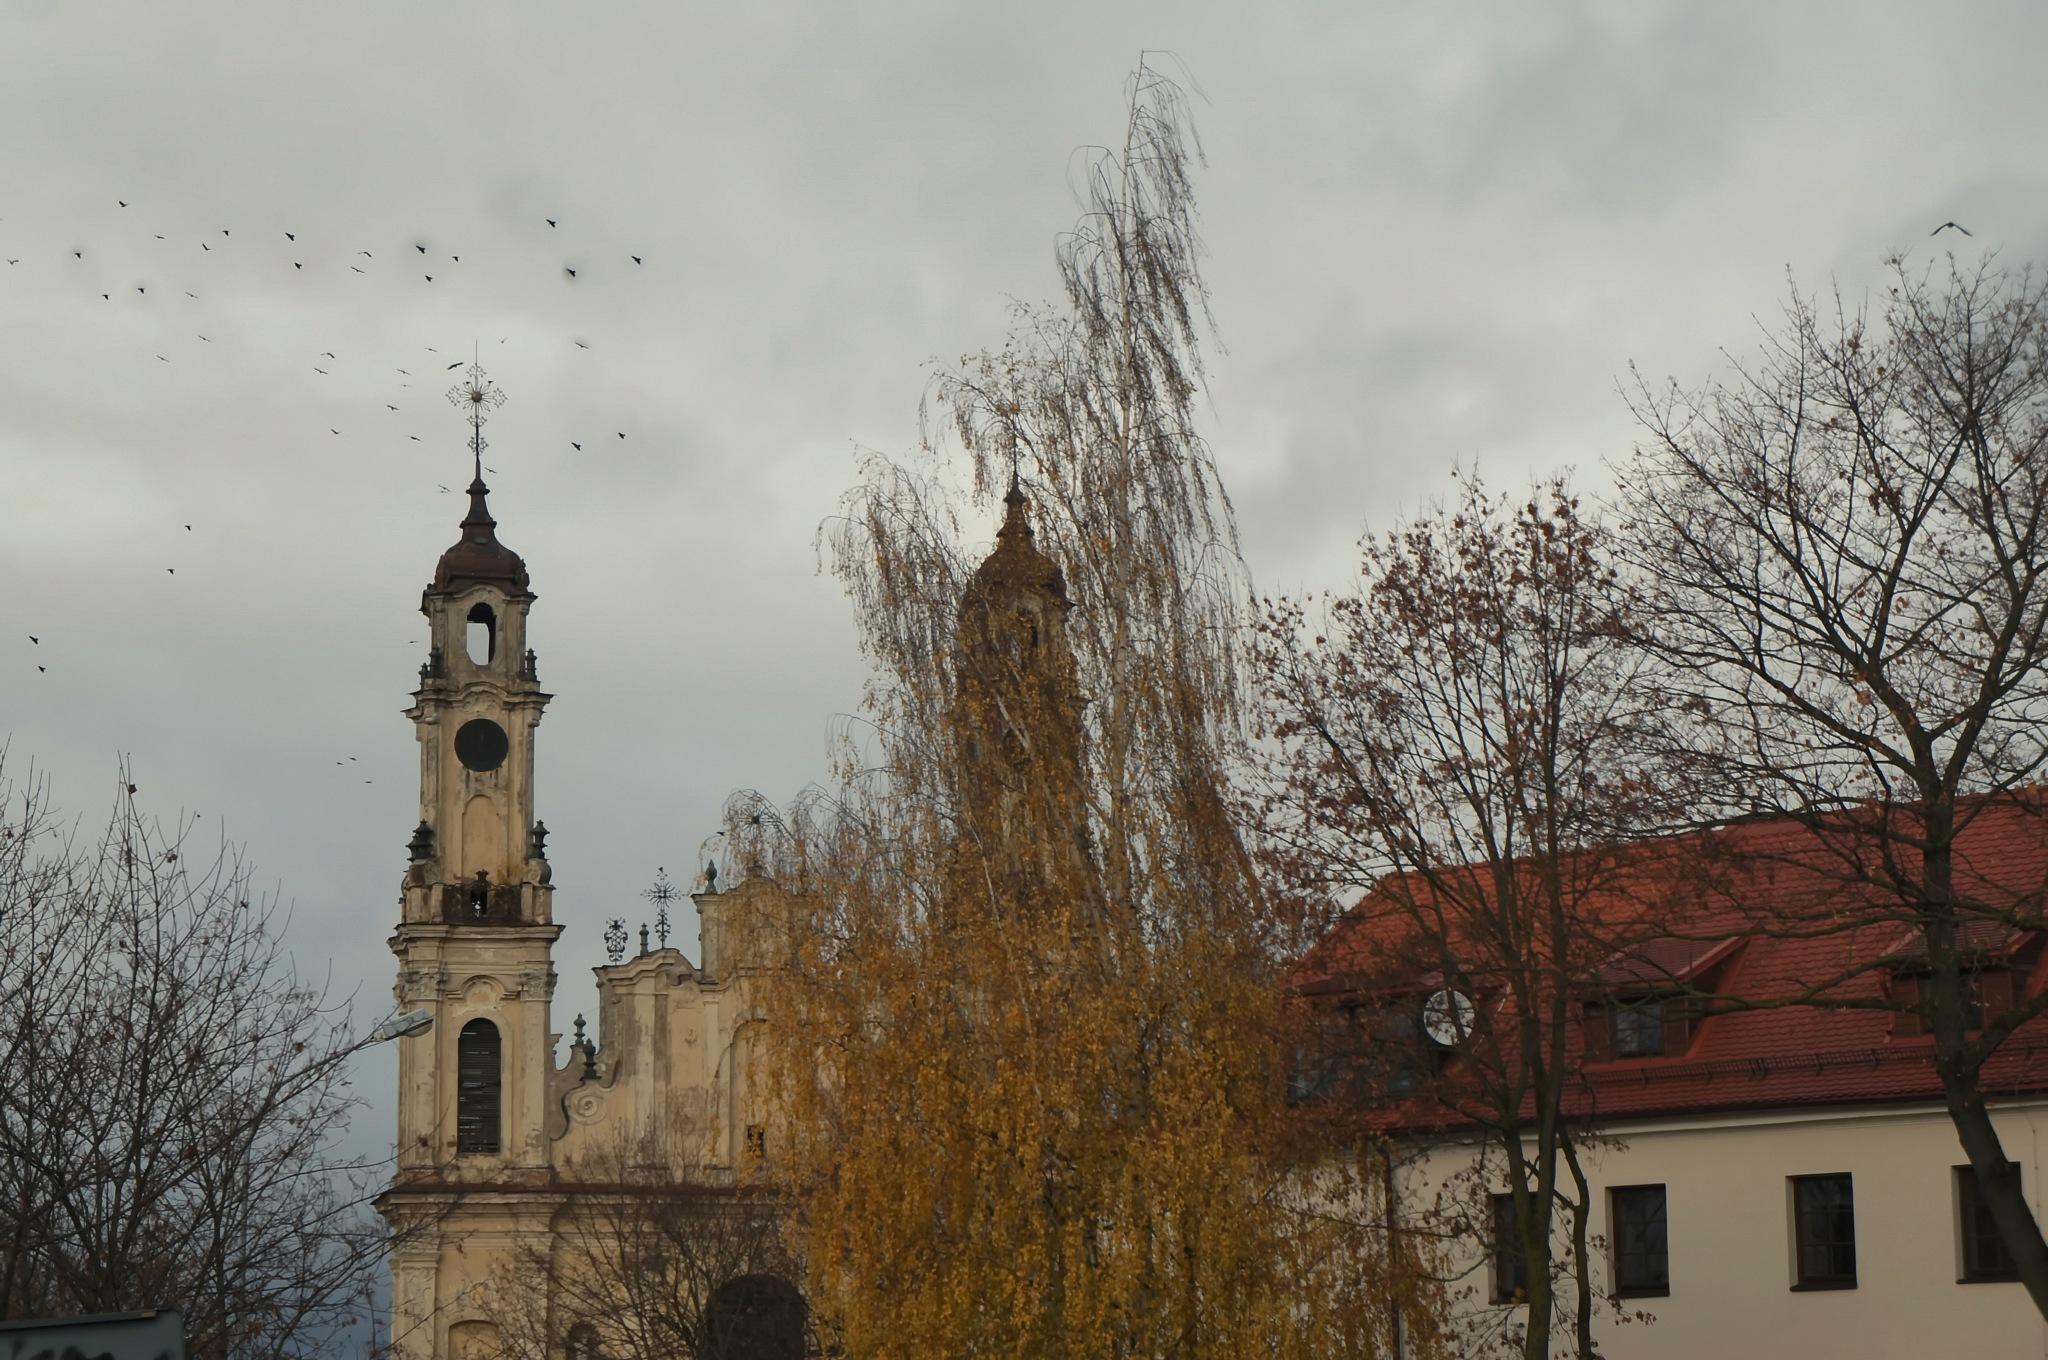 The Church of the Ascension by tania.skaradek